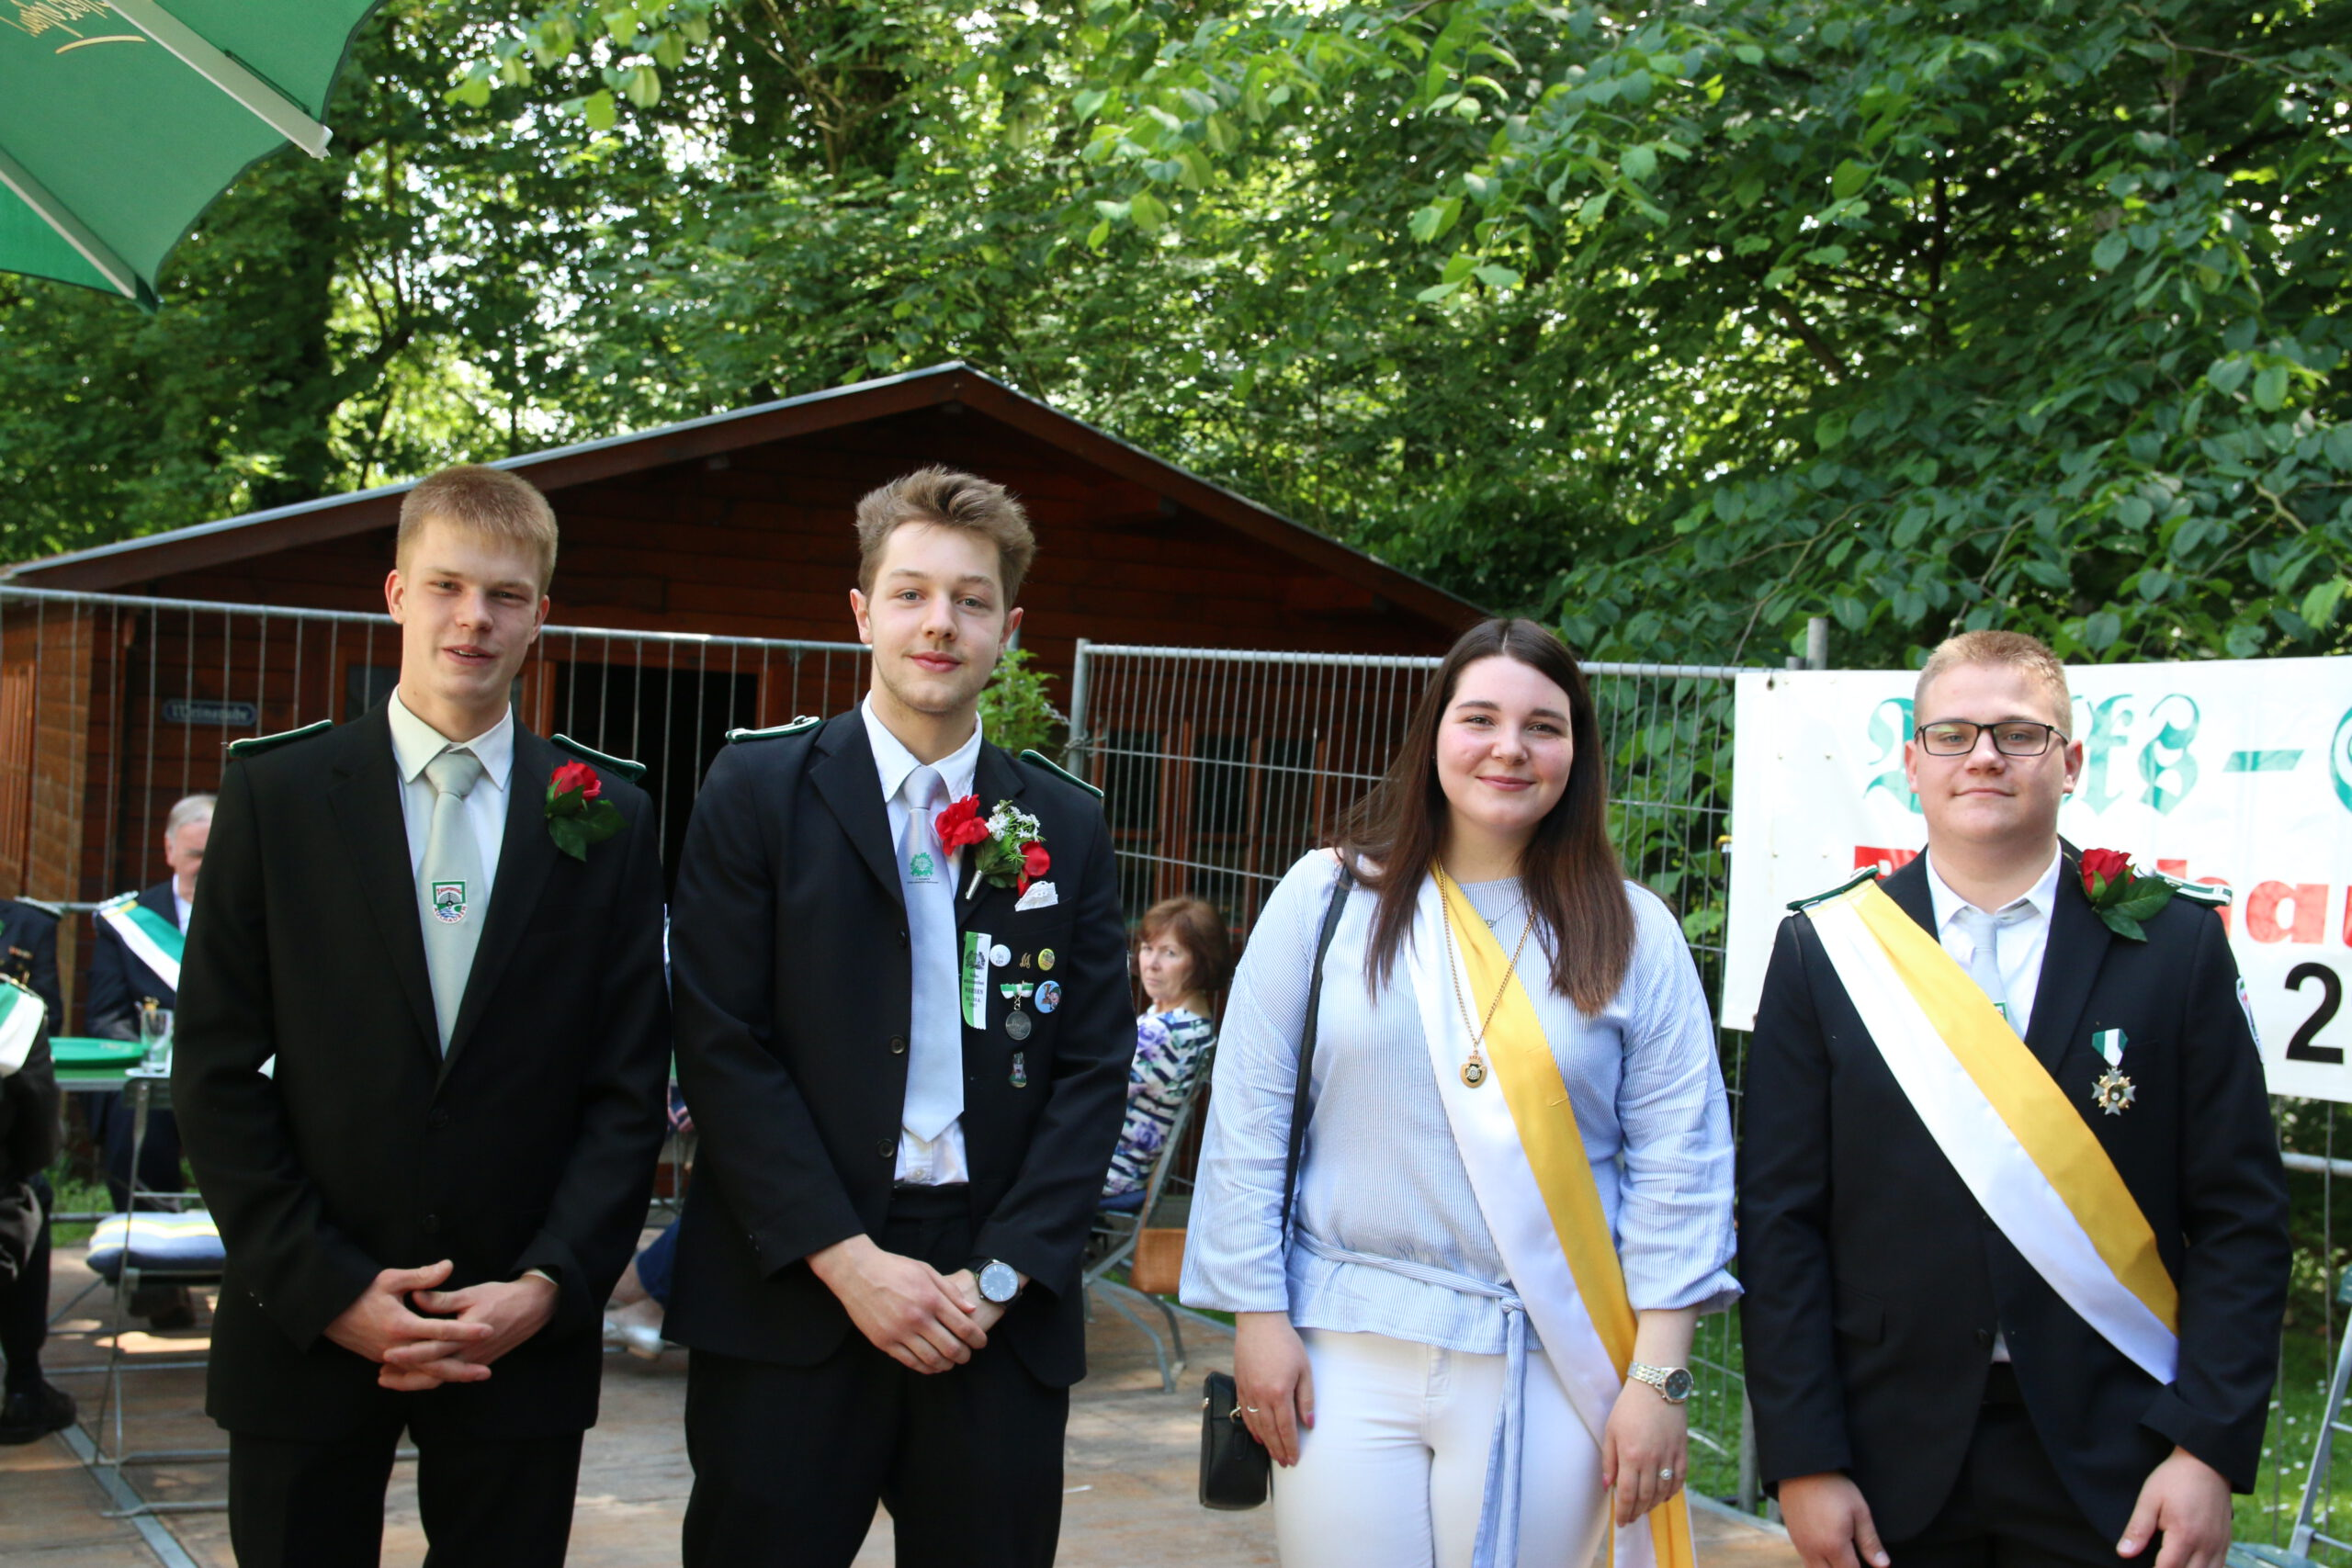 Unser neuer Jugendkönig heißt Frederick Meyer!